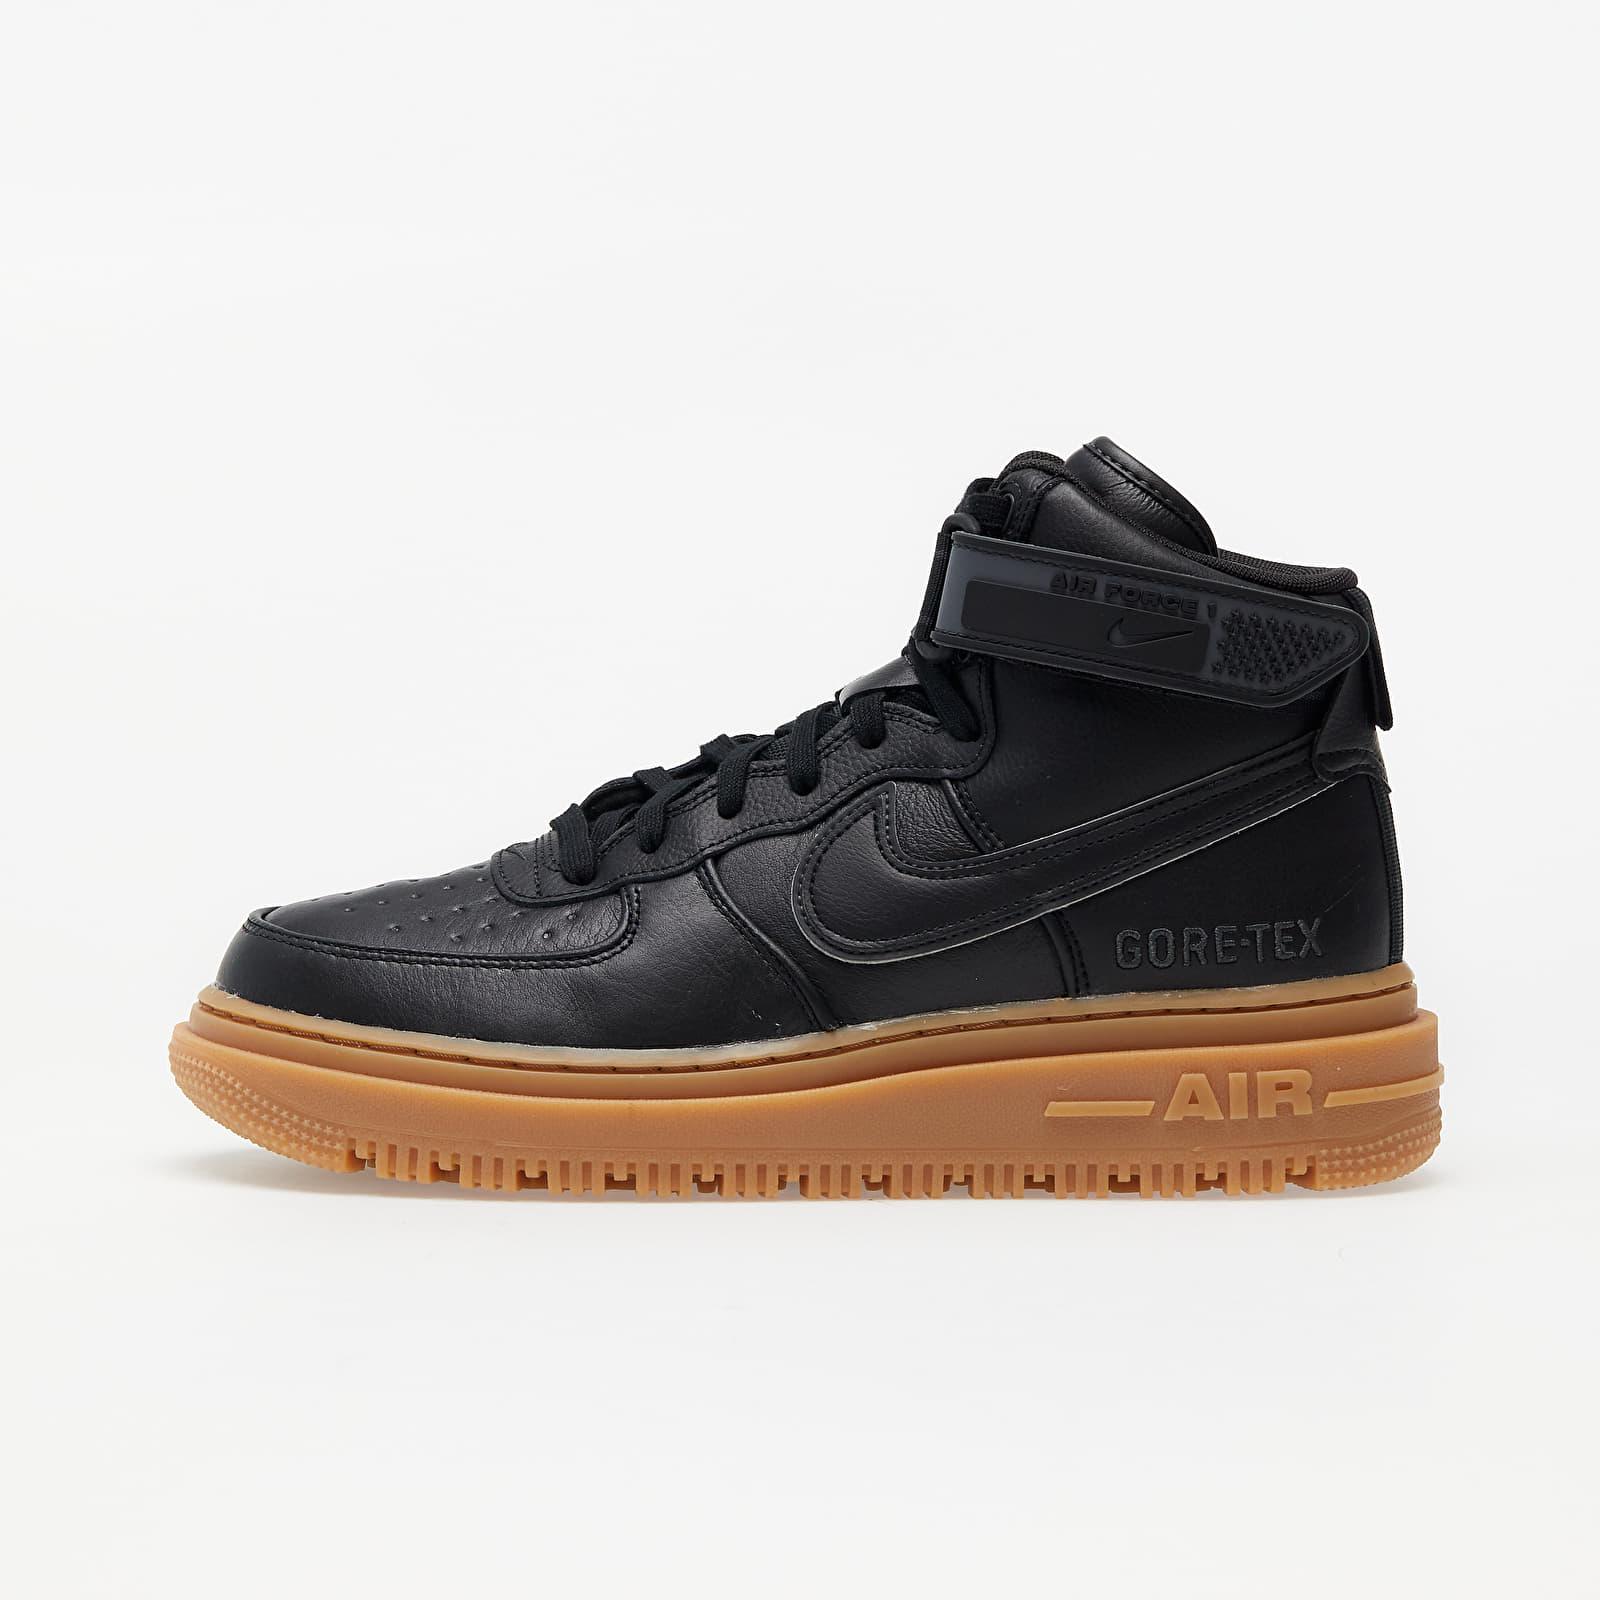 Nike Air Force 1 Gore-Tex Boot Black/ Black-Anthracite-Gum Med Brown EUR 43